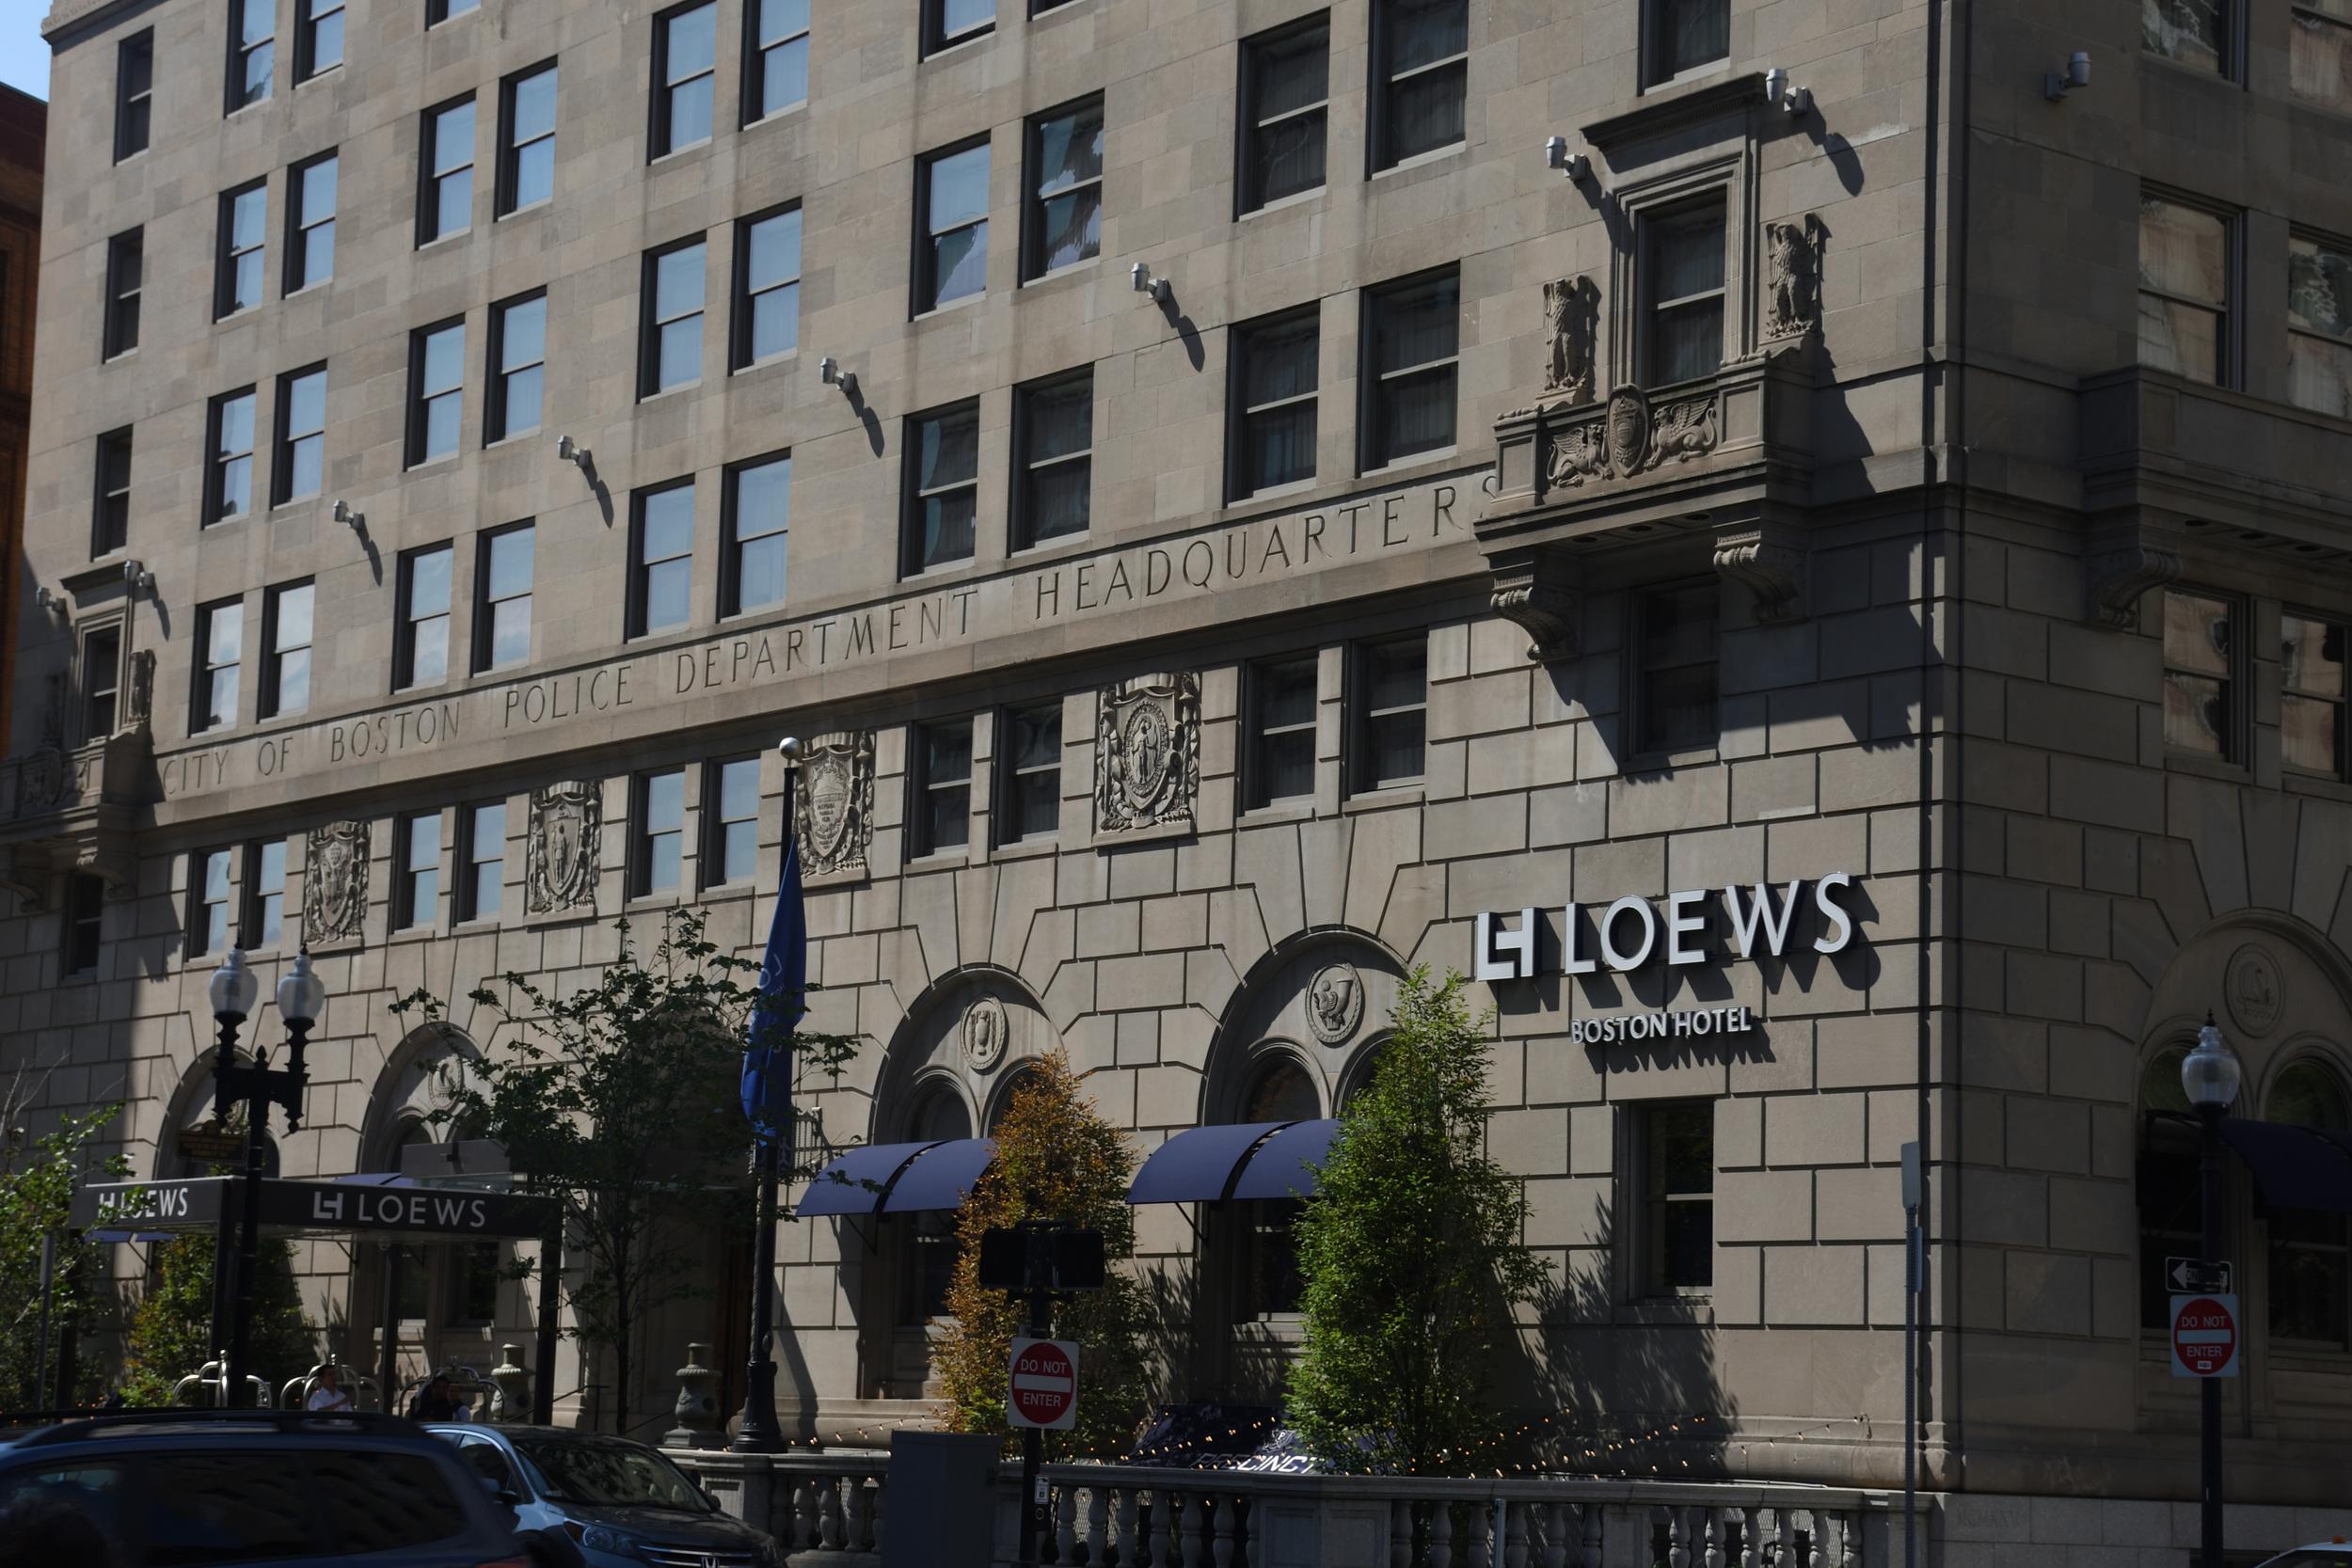 Loews Boston Hotel 2016